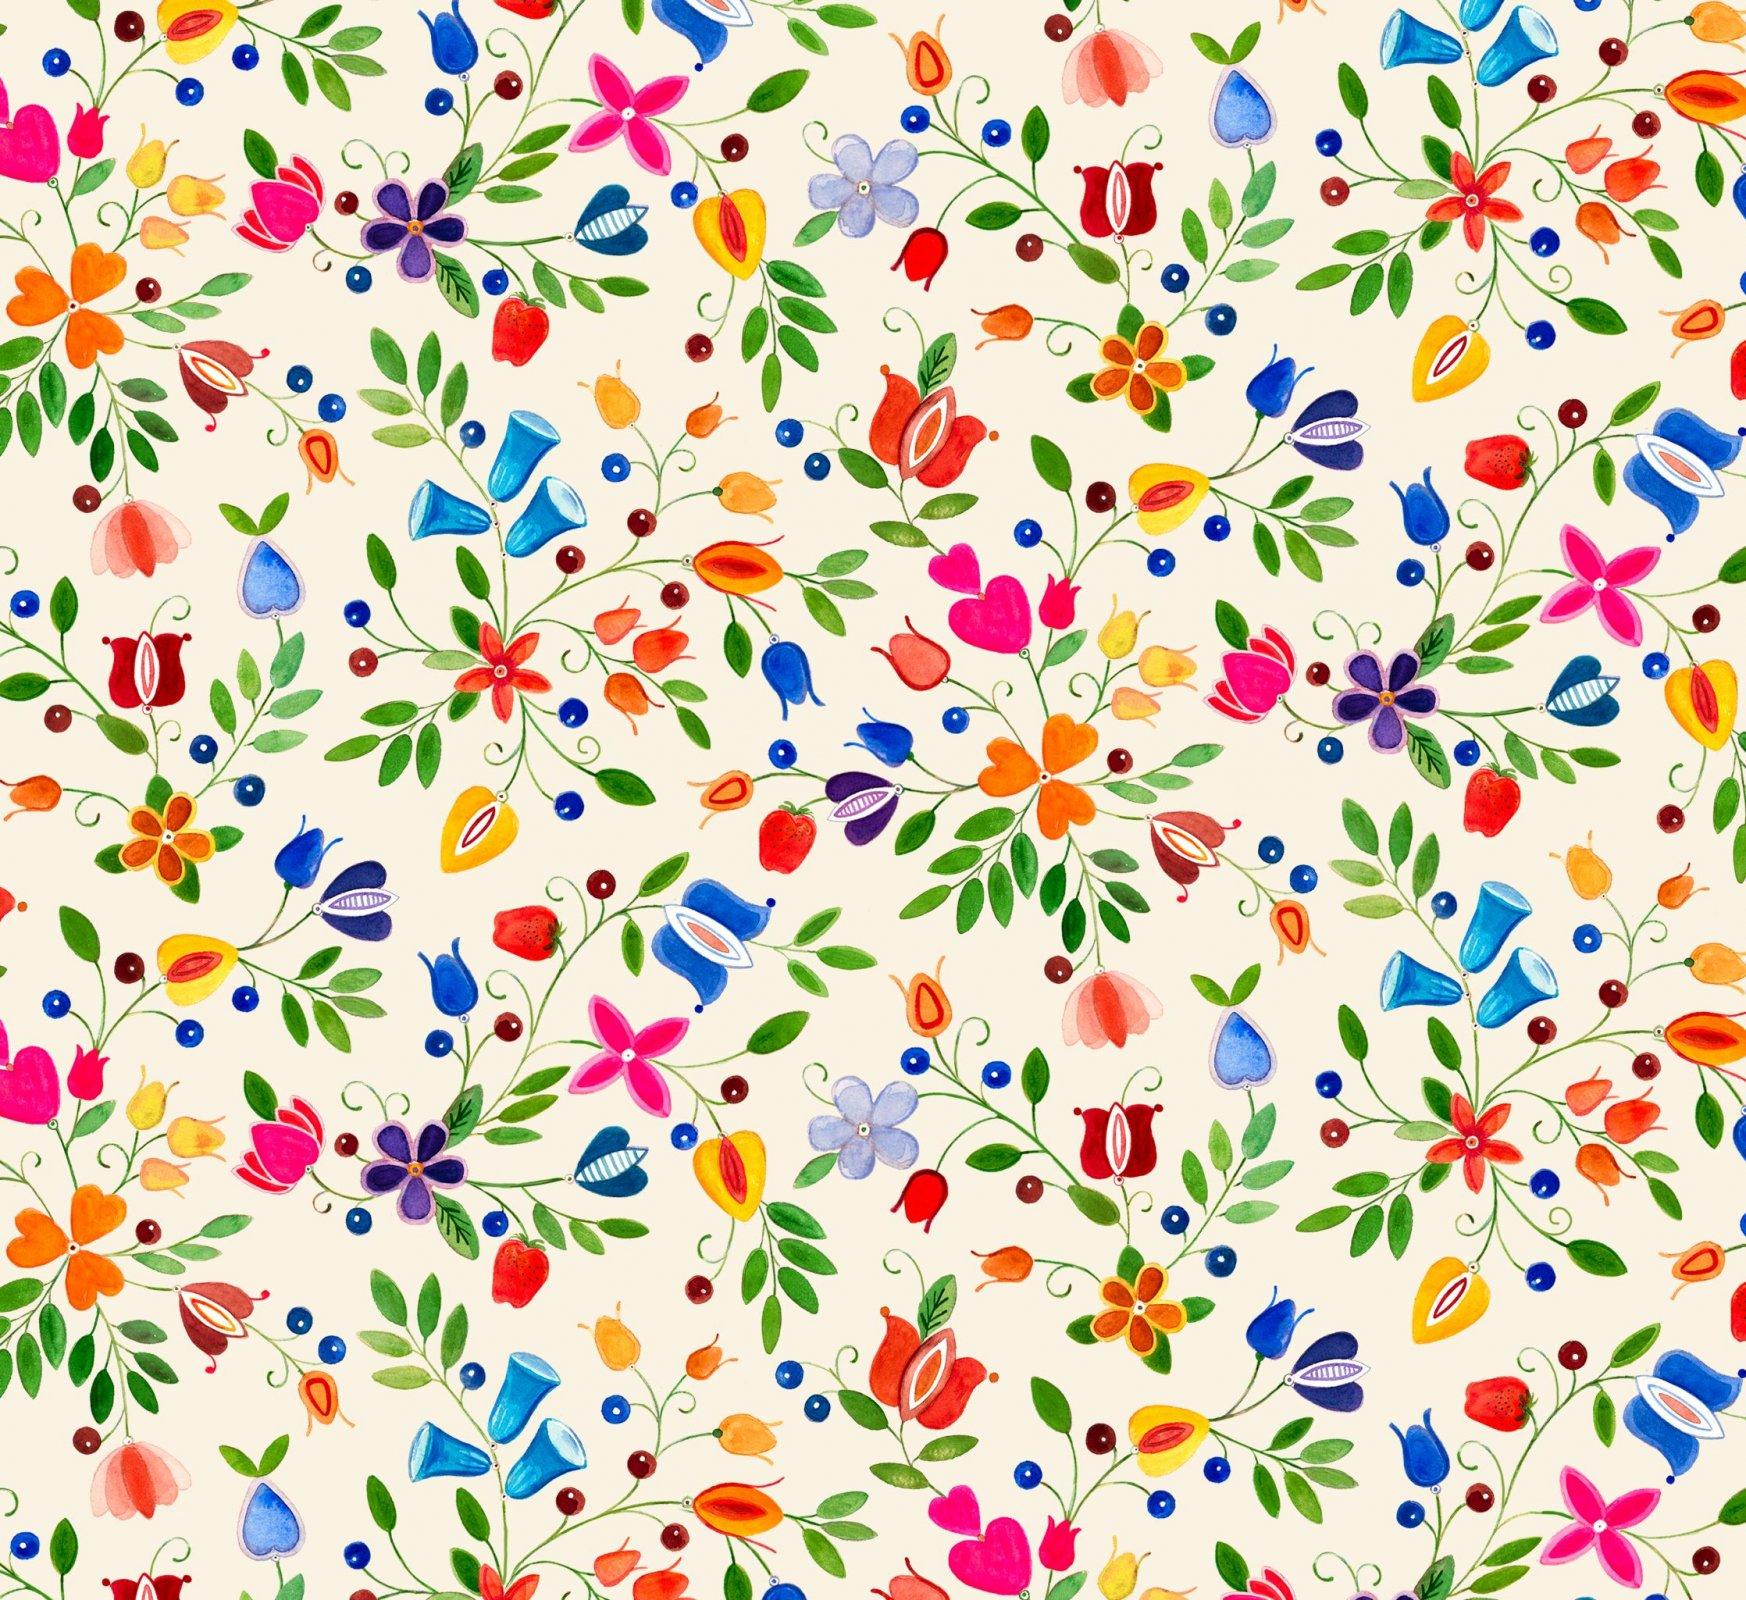 ES-Shawl Dancers 32002 Cream - Small Floral